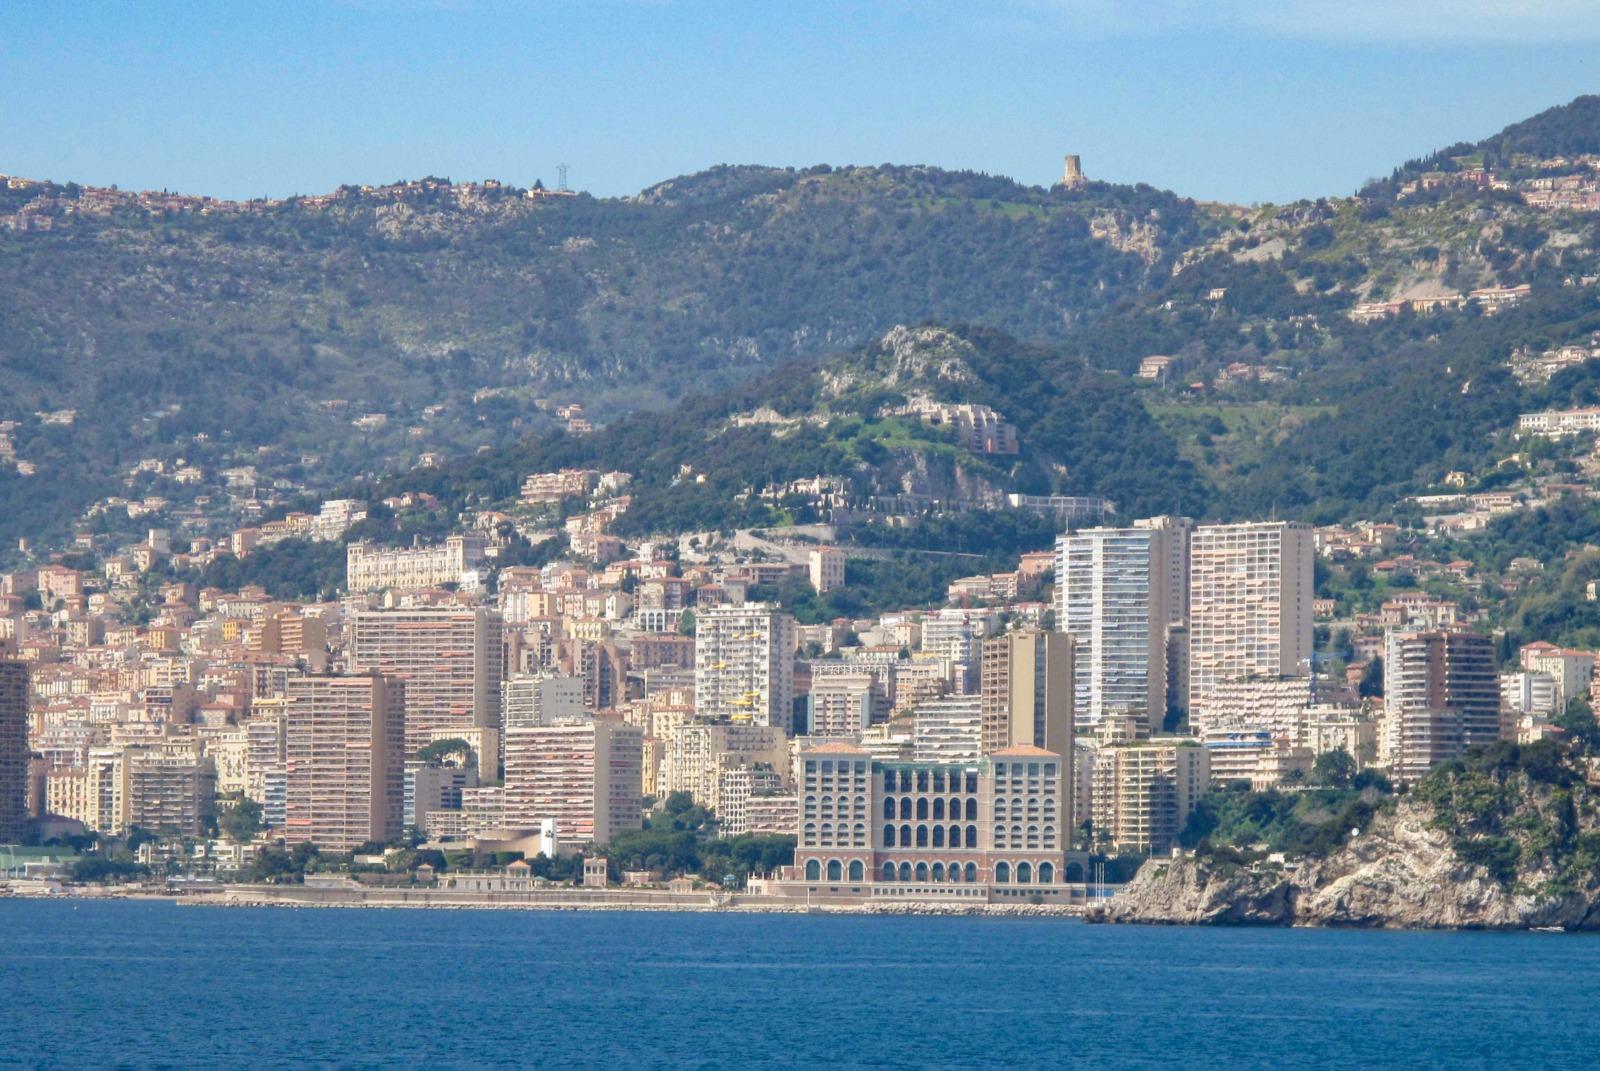 Monaco and Trophy of the Alpes from Cap-Martin. Photo: Tangopaso (Public Domain)